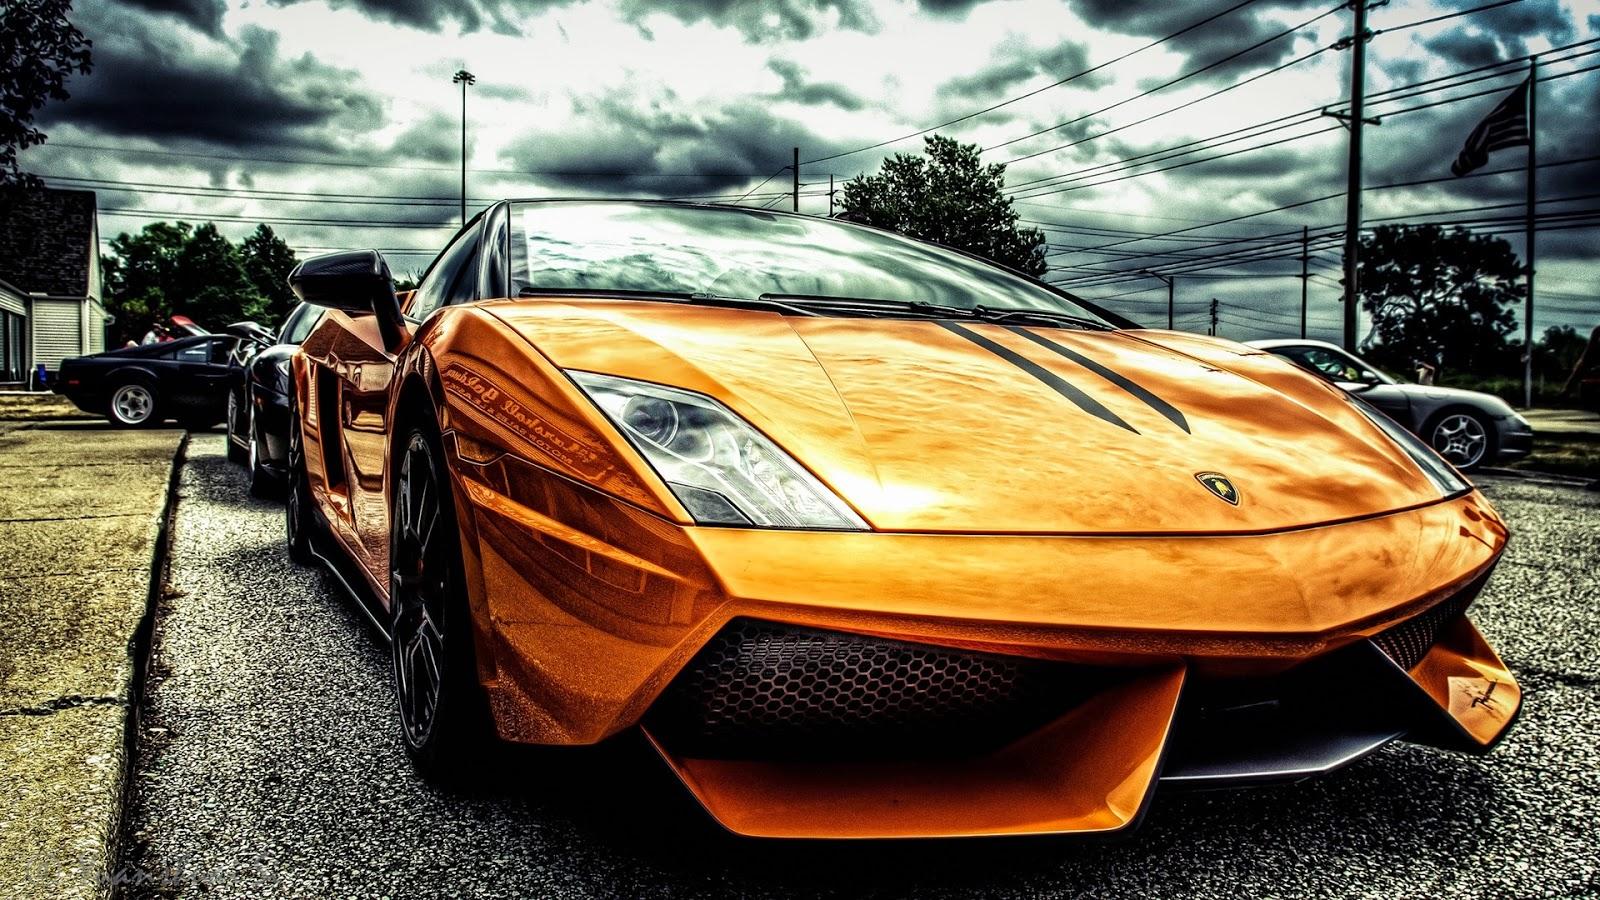 Lamborghini Pics in high quality   Eilac